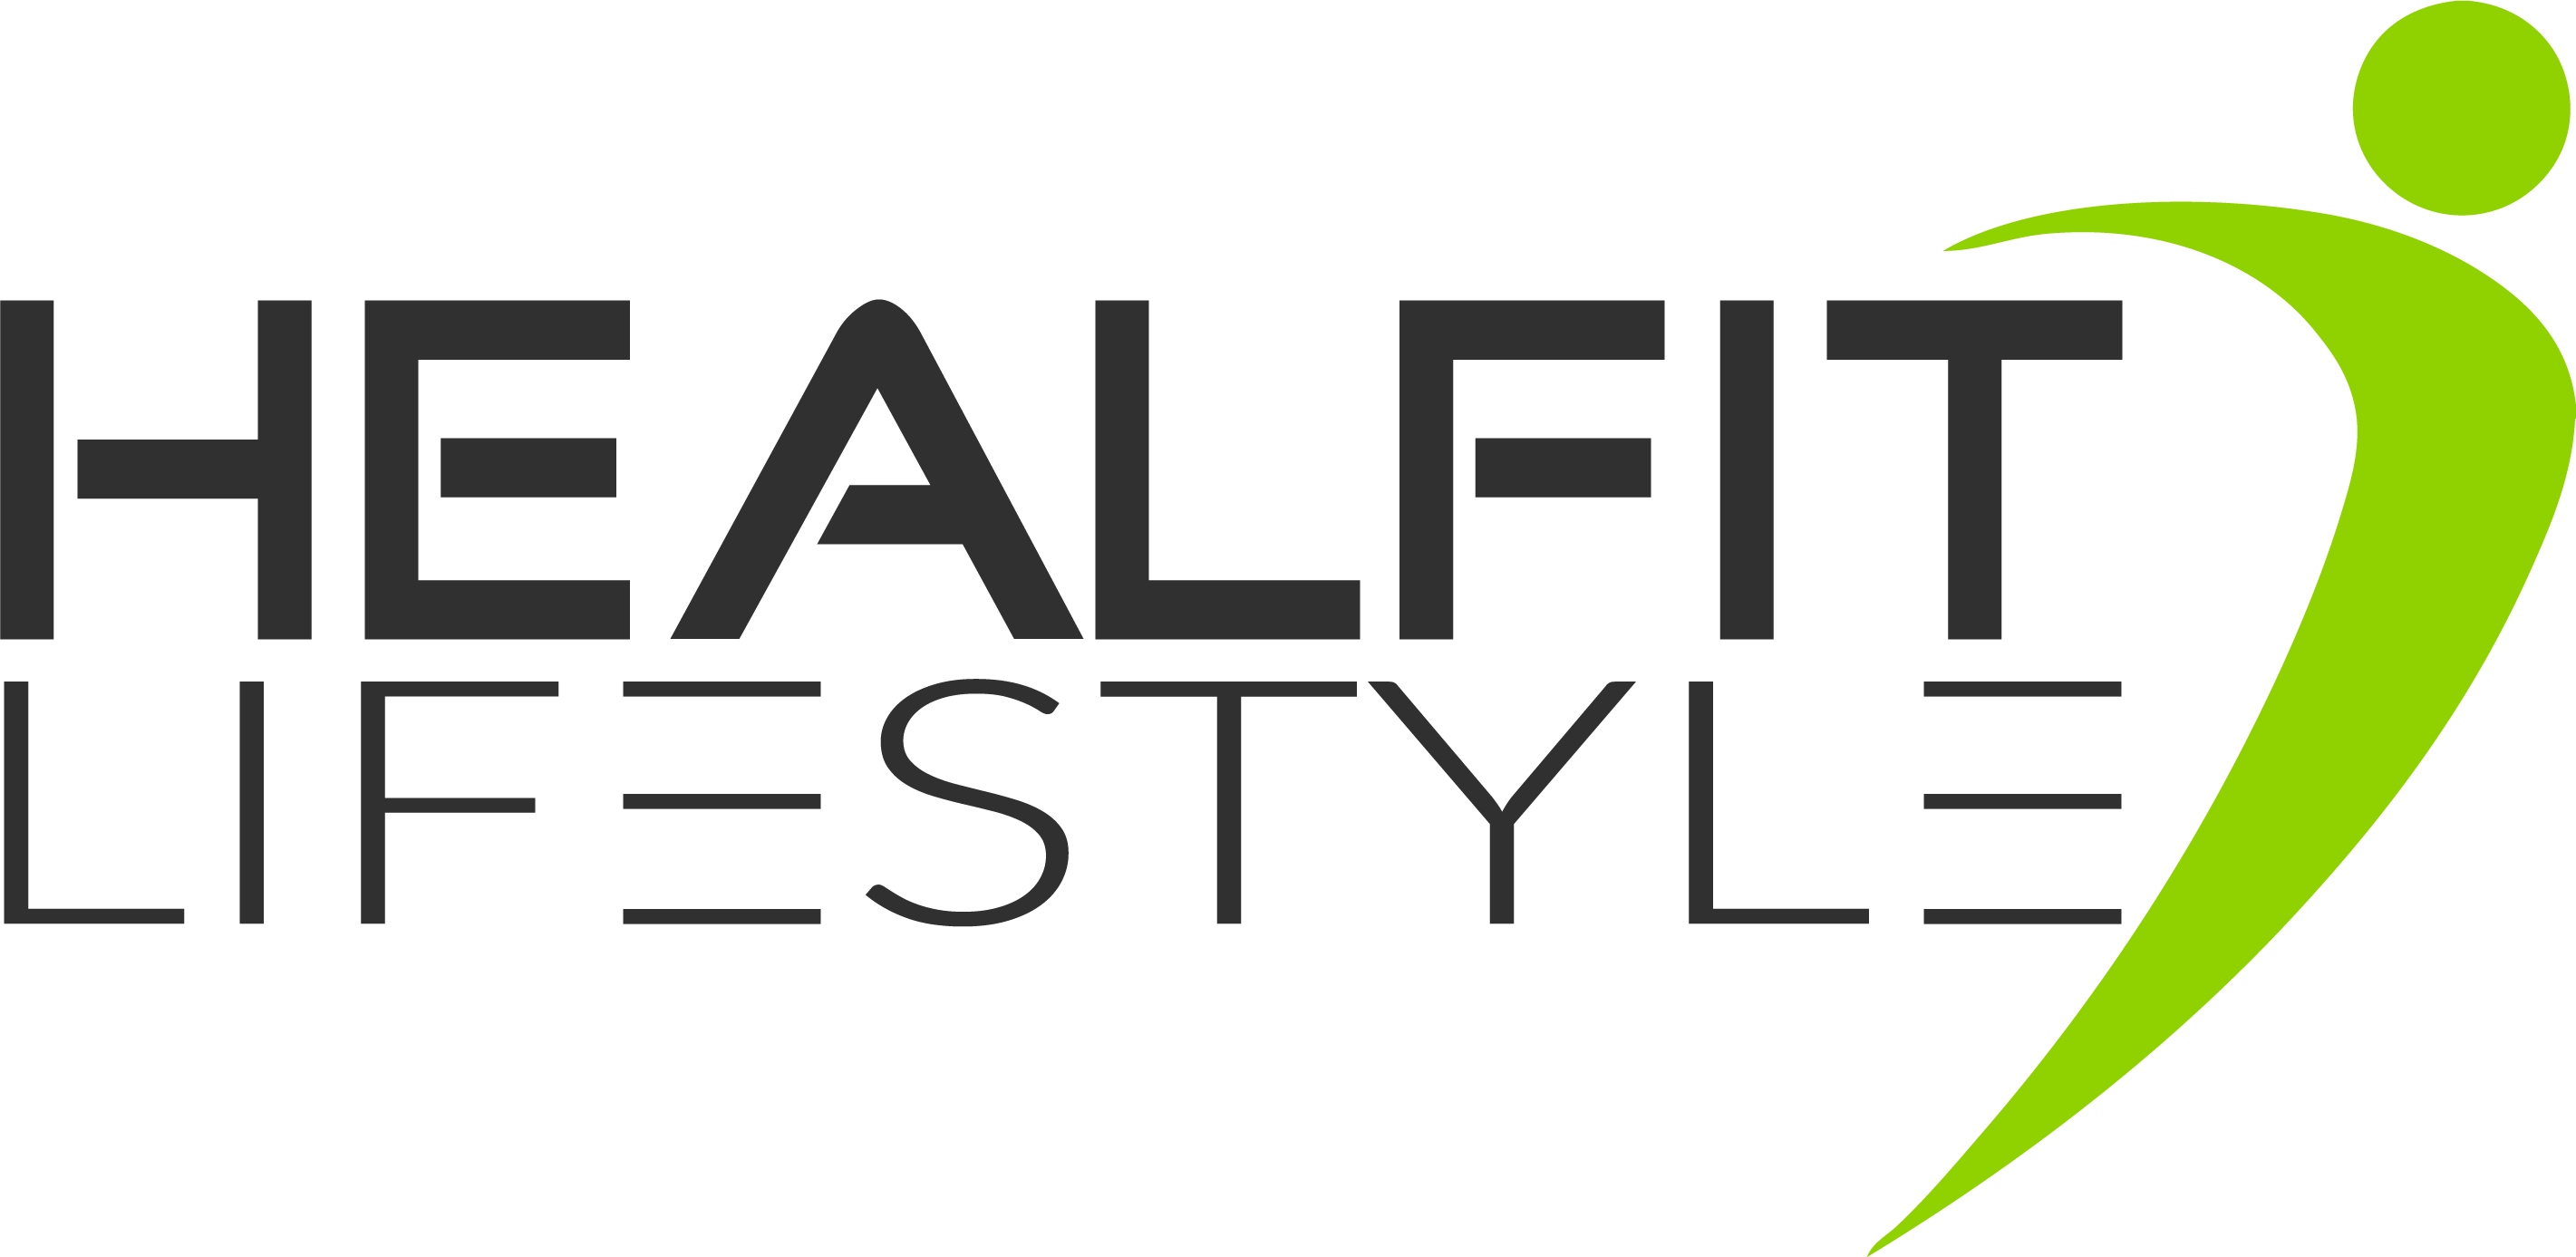 HealFit